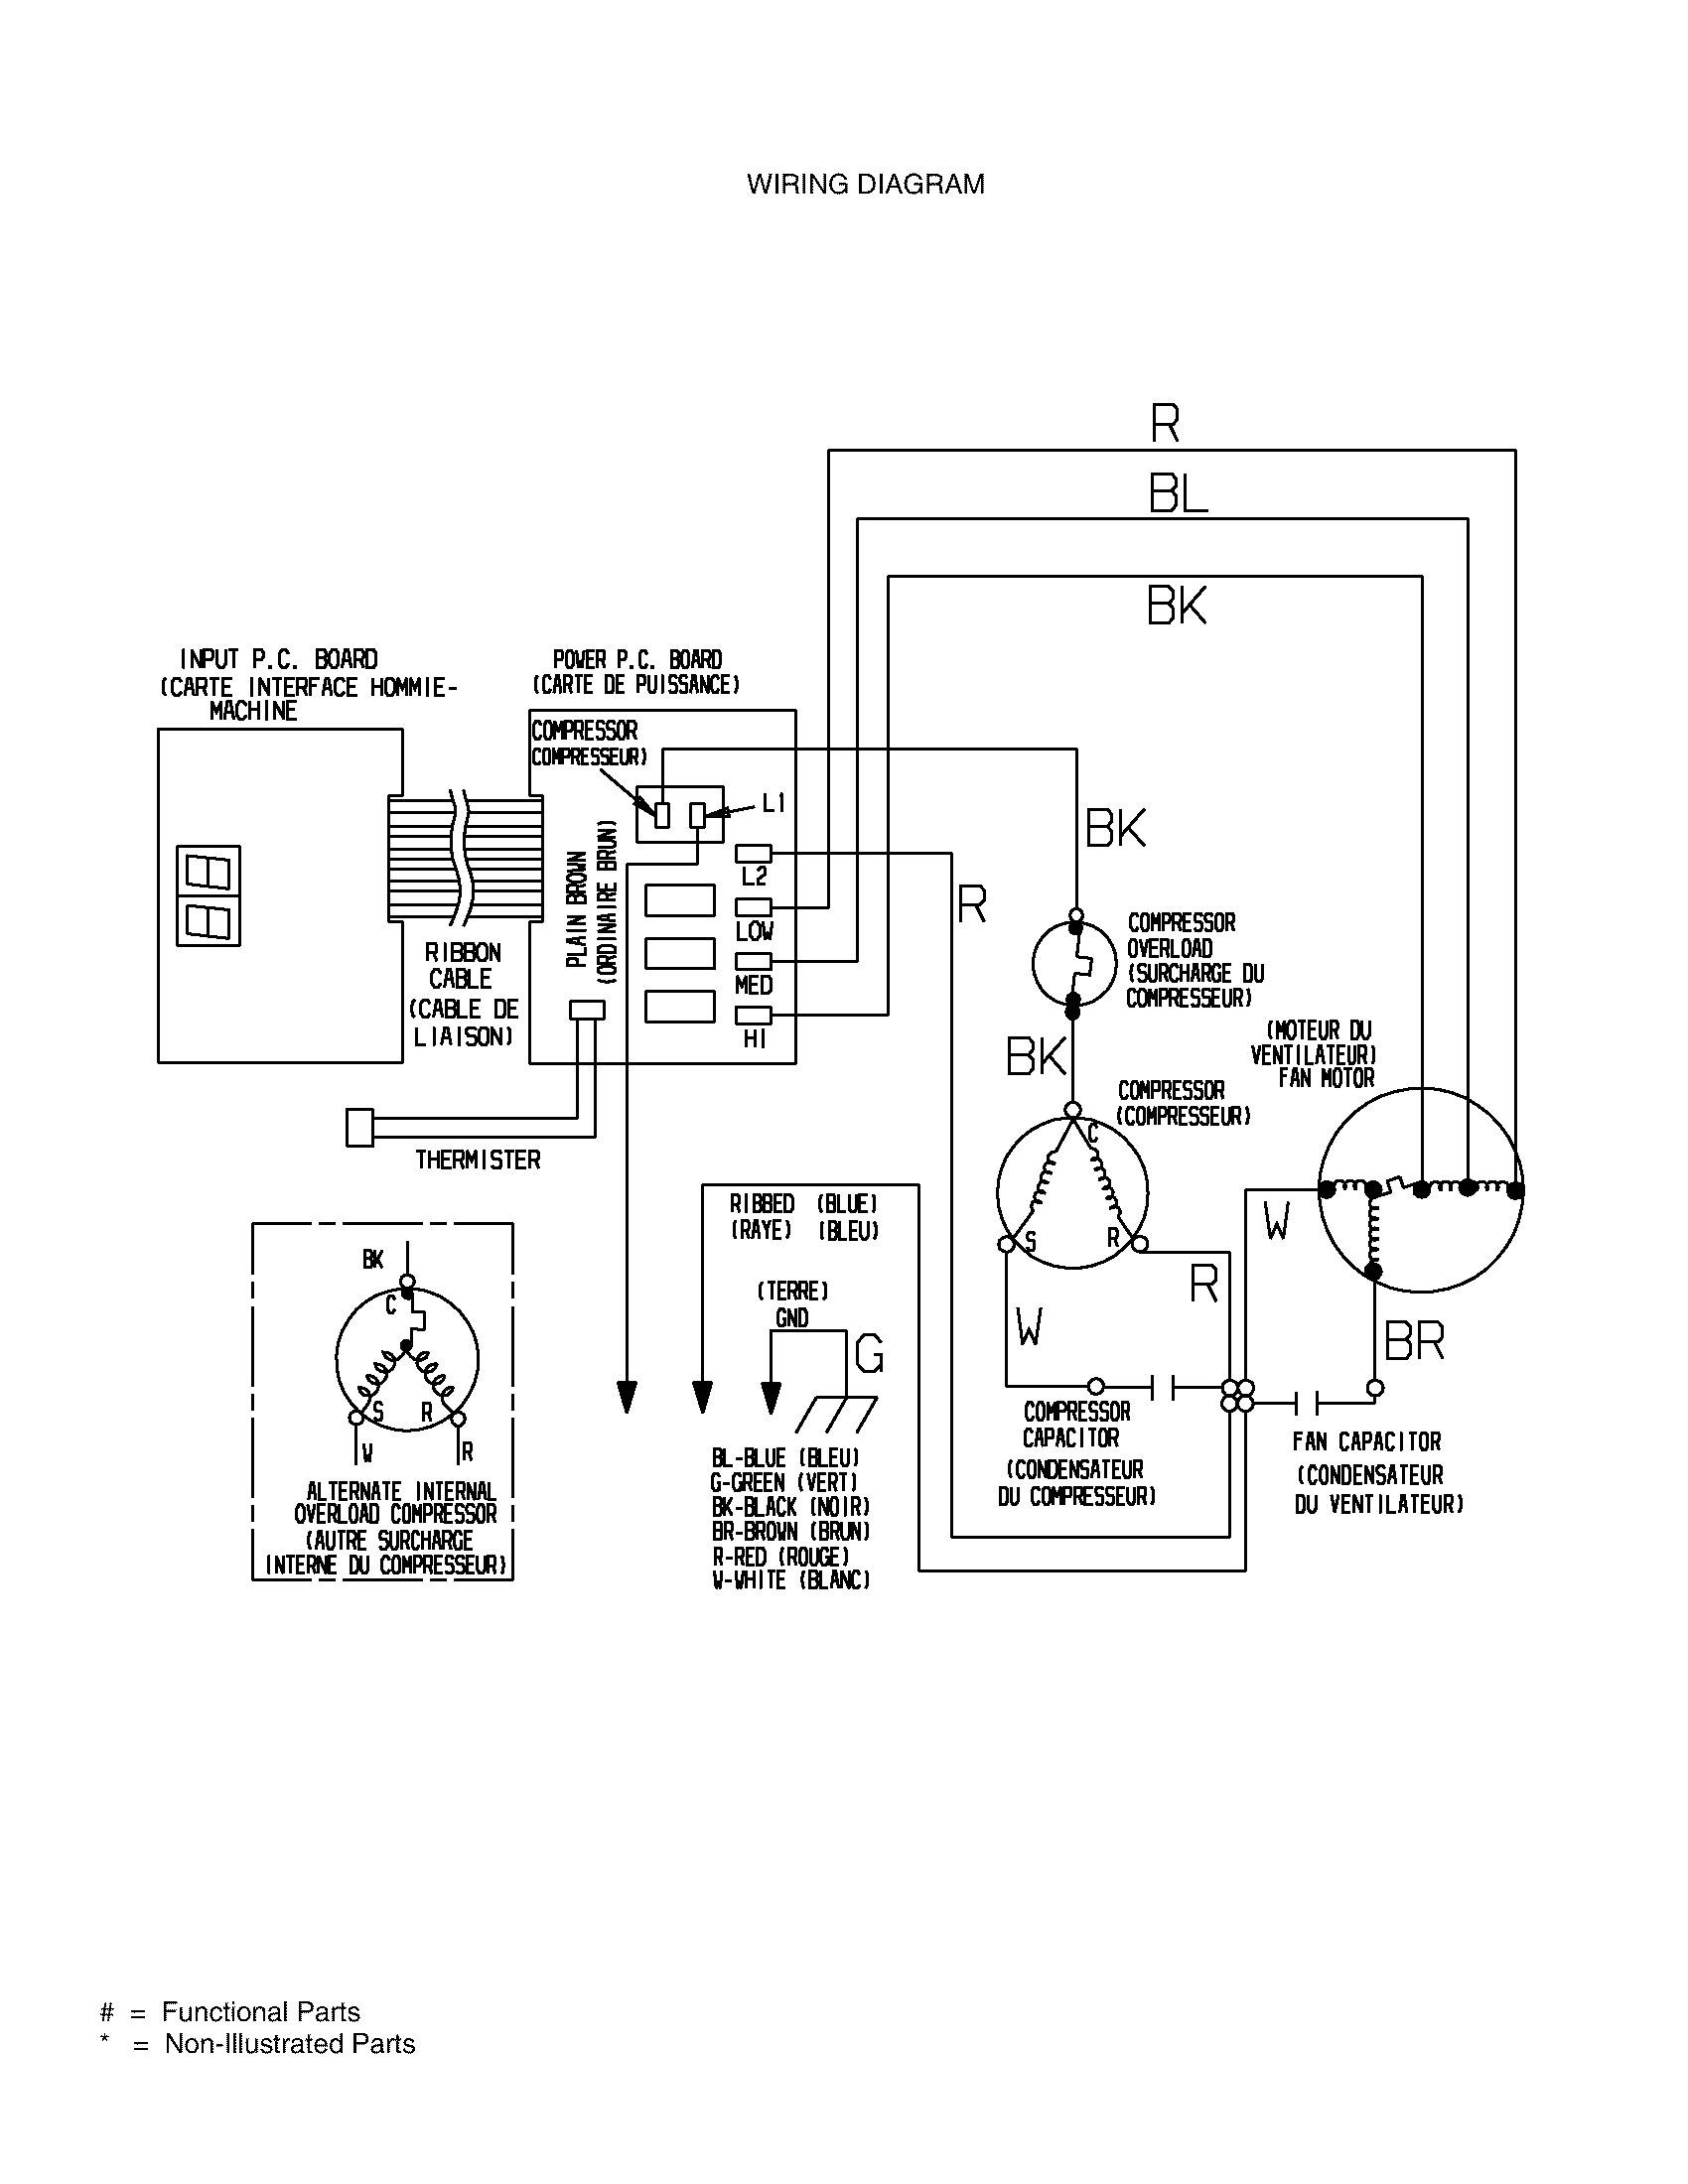 1700x2200 air schematic symbols septic tank problems when it rains diagram